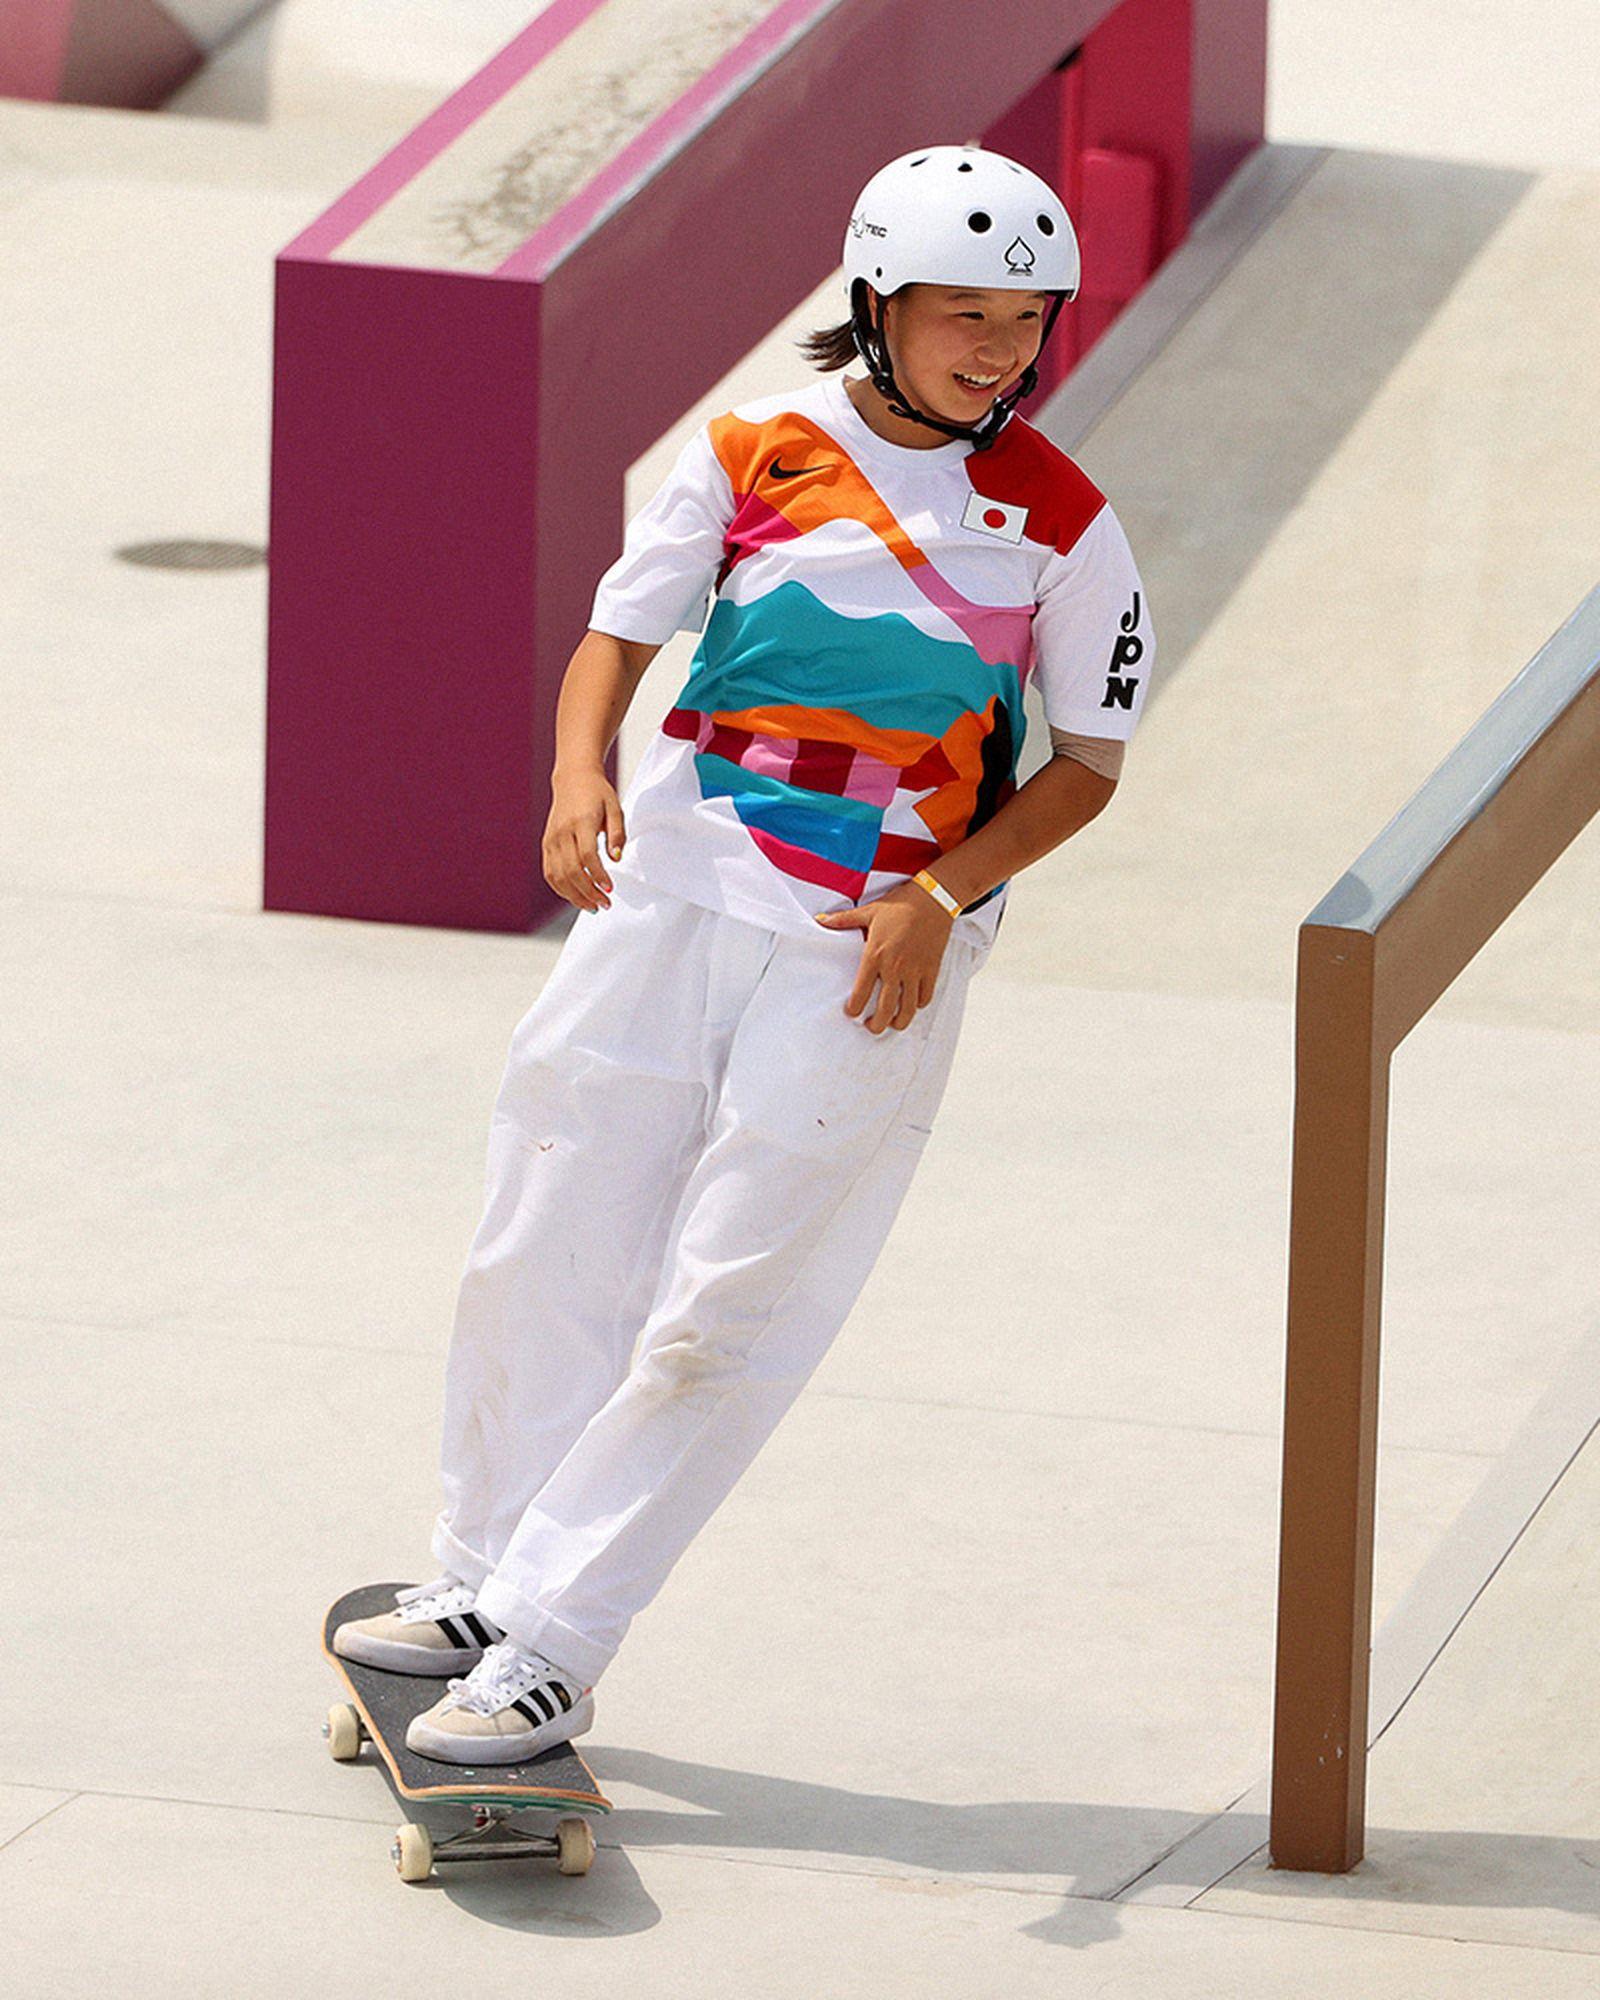 stockx-tokyo-olympics-resale-report-01